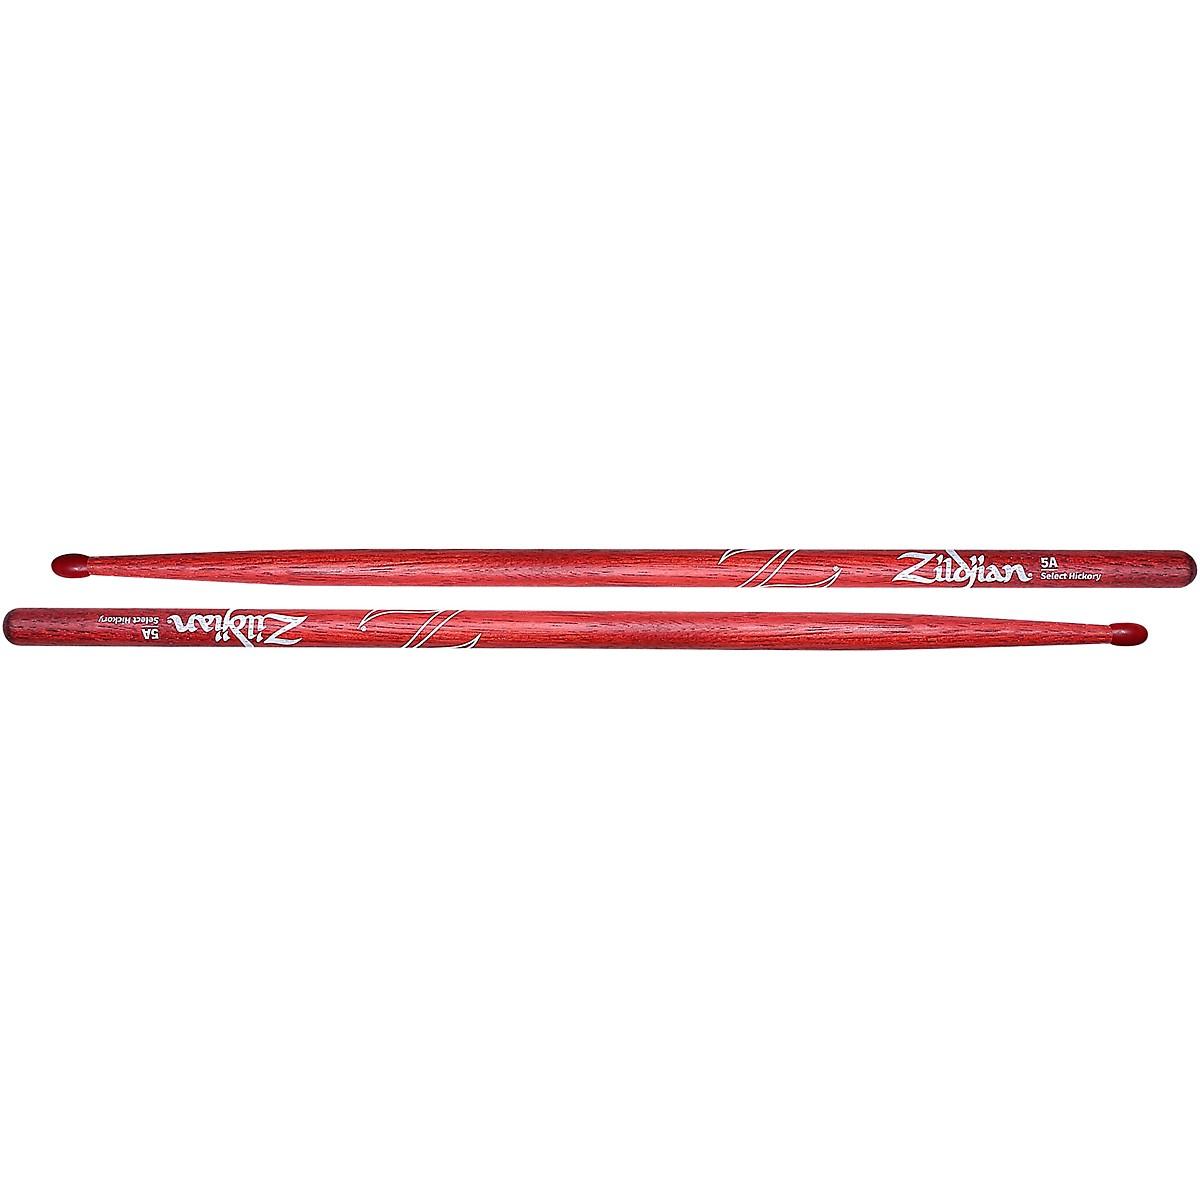 Zildjian Red Drum Sticks